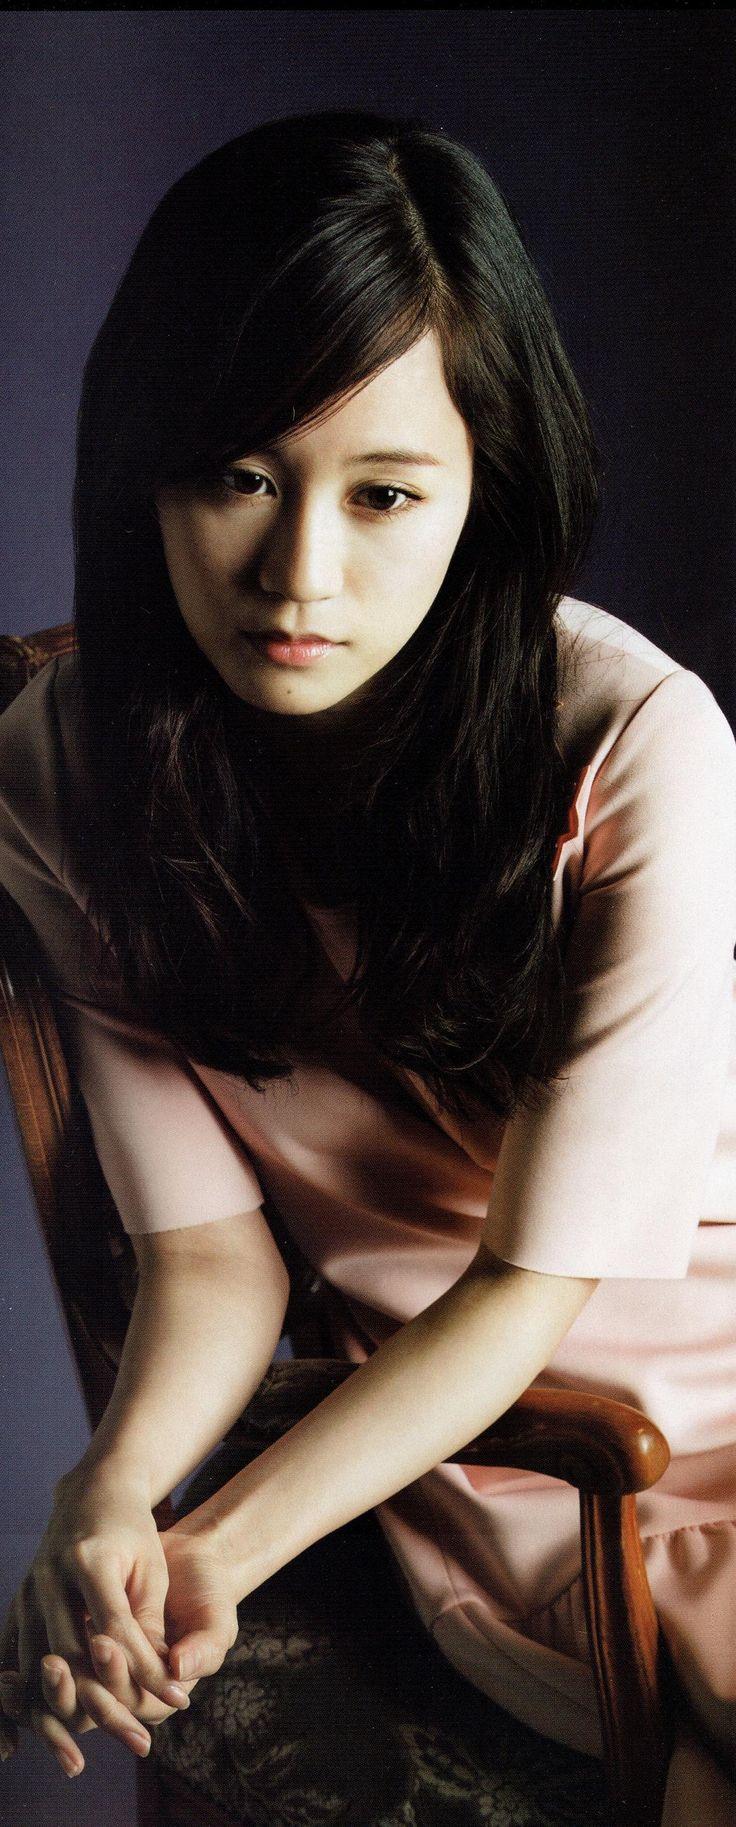 前田敦子 | Atsuko Maeda